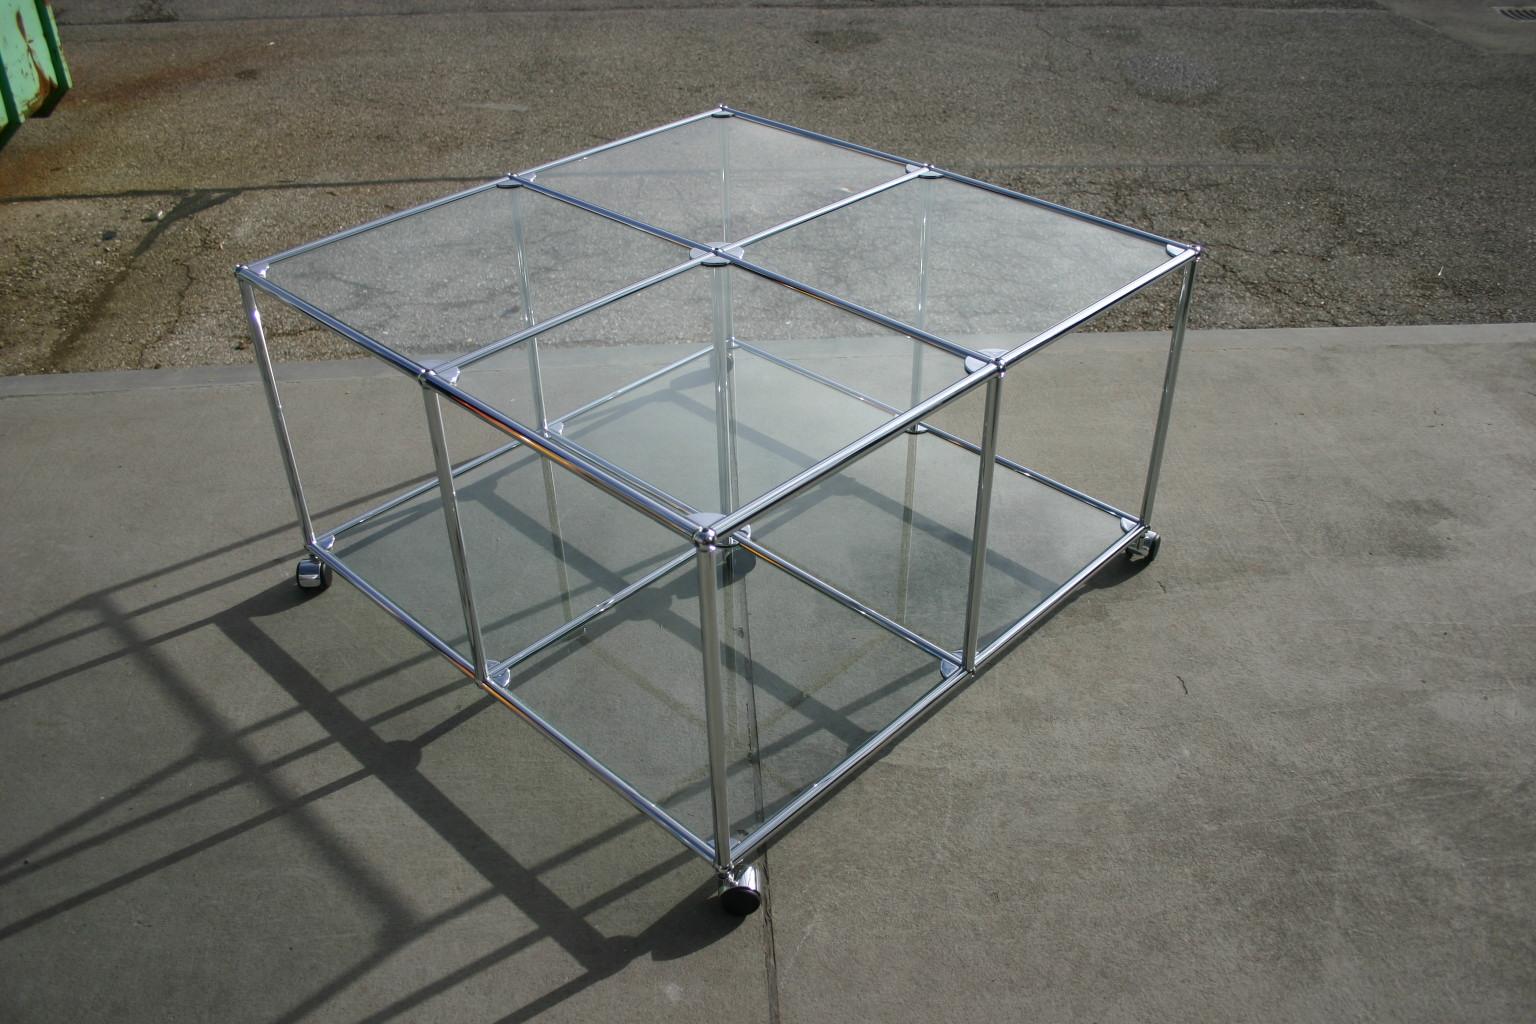 tisch von usm haller in glas vitrinen glas usm. Black Bedroom Furniture Sets. Home Design Ideas